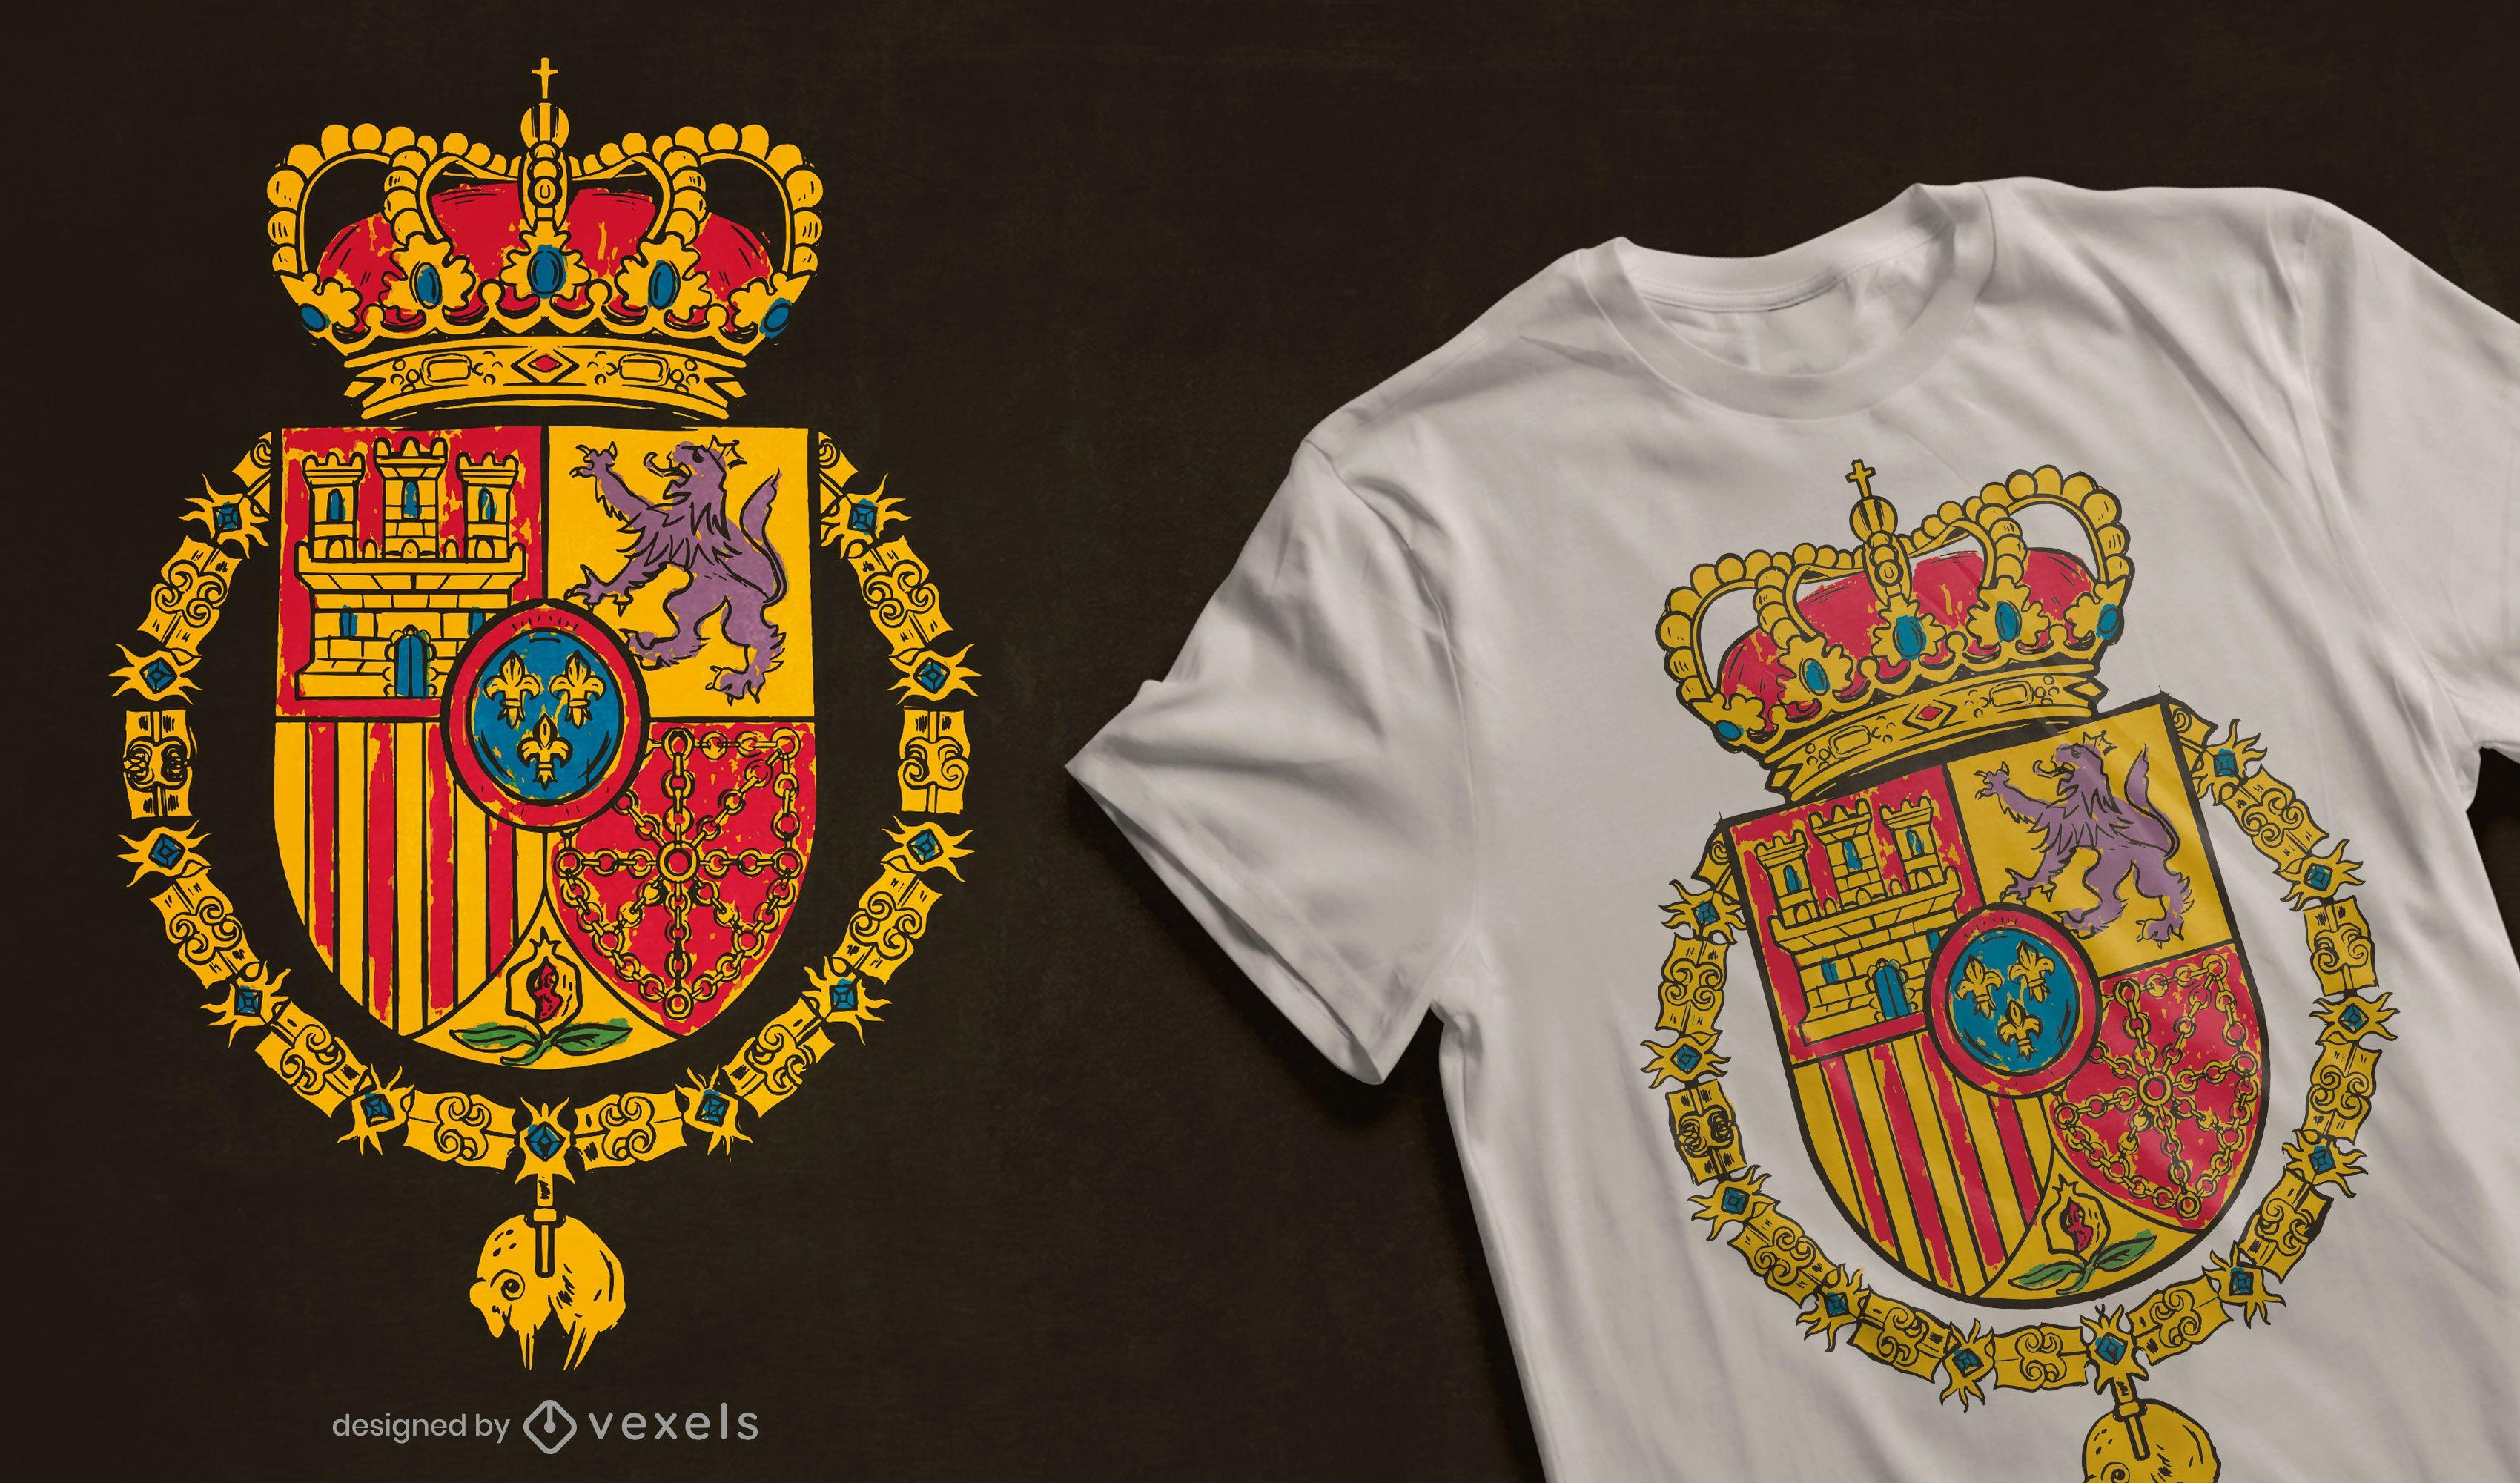 Spain Royal Standard t-shirt design